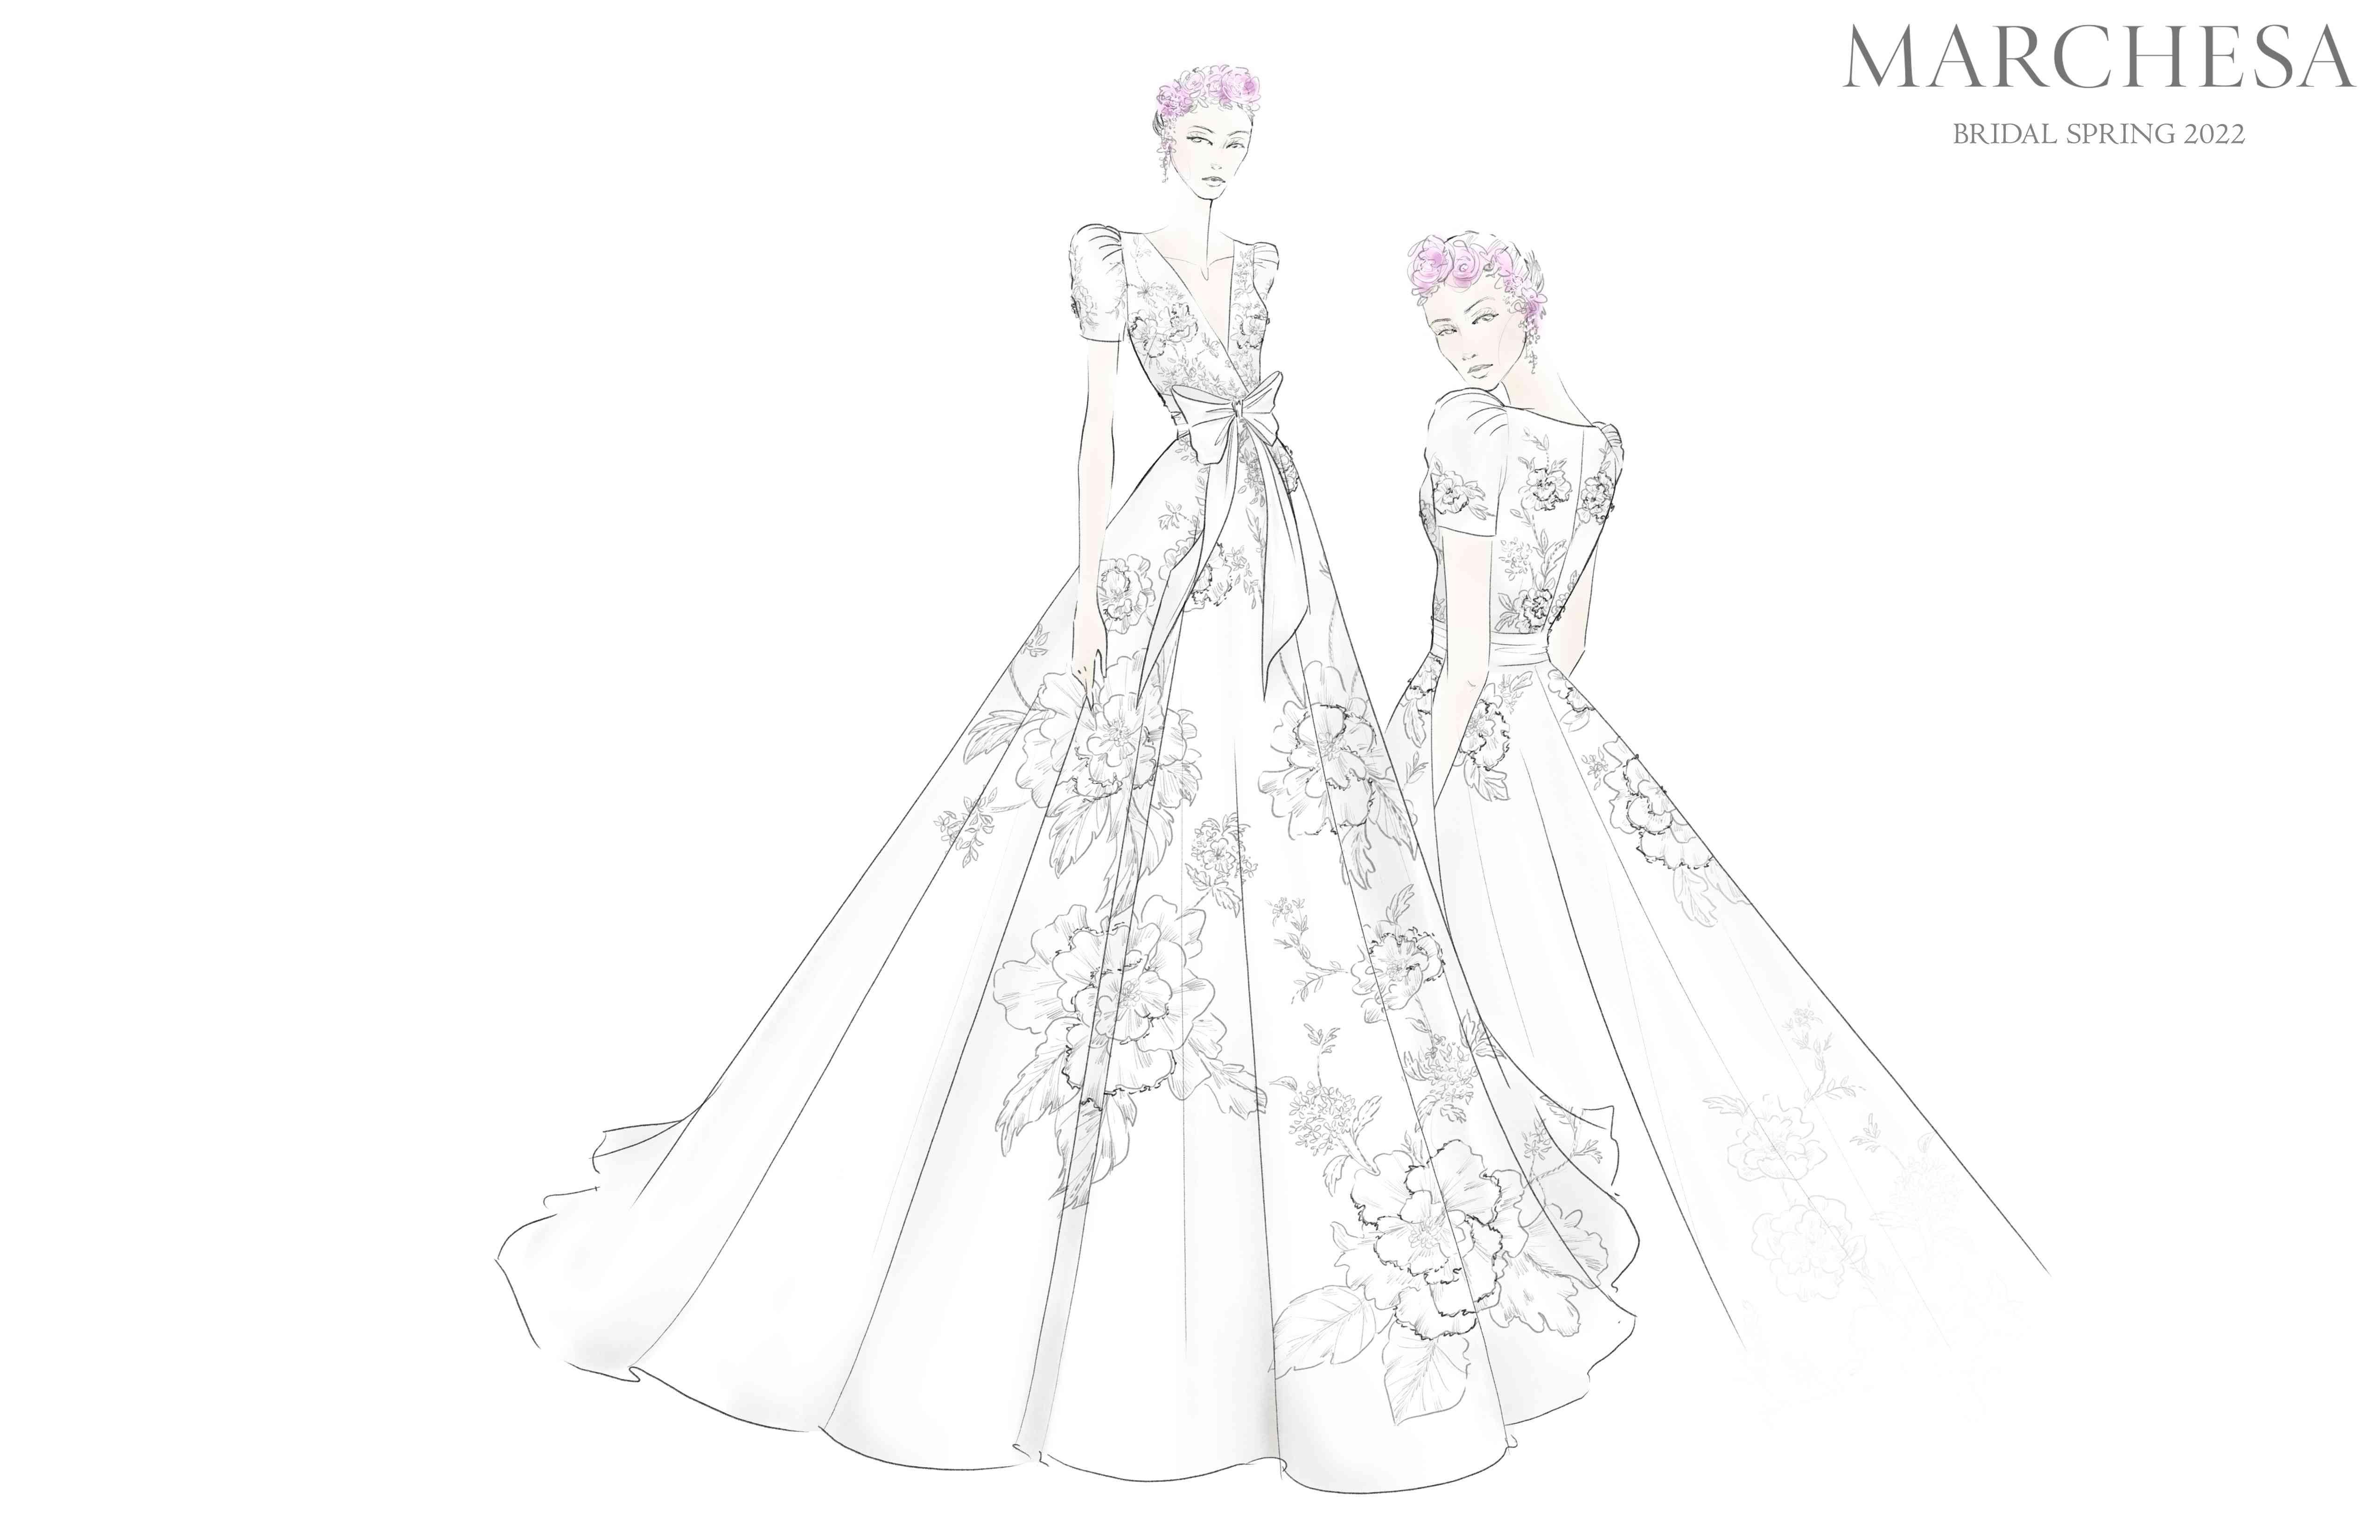 Marchesa Bridal Couture